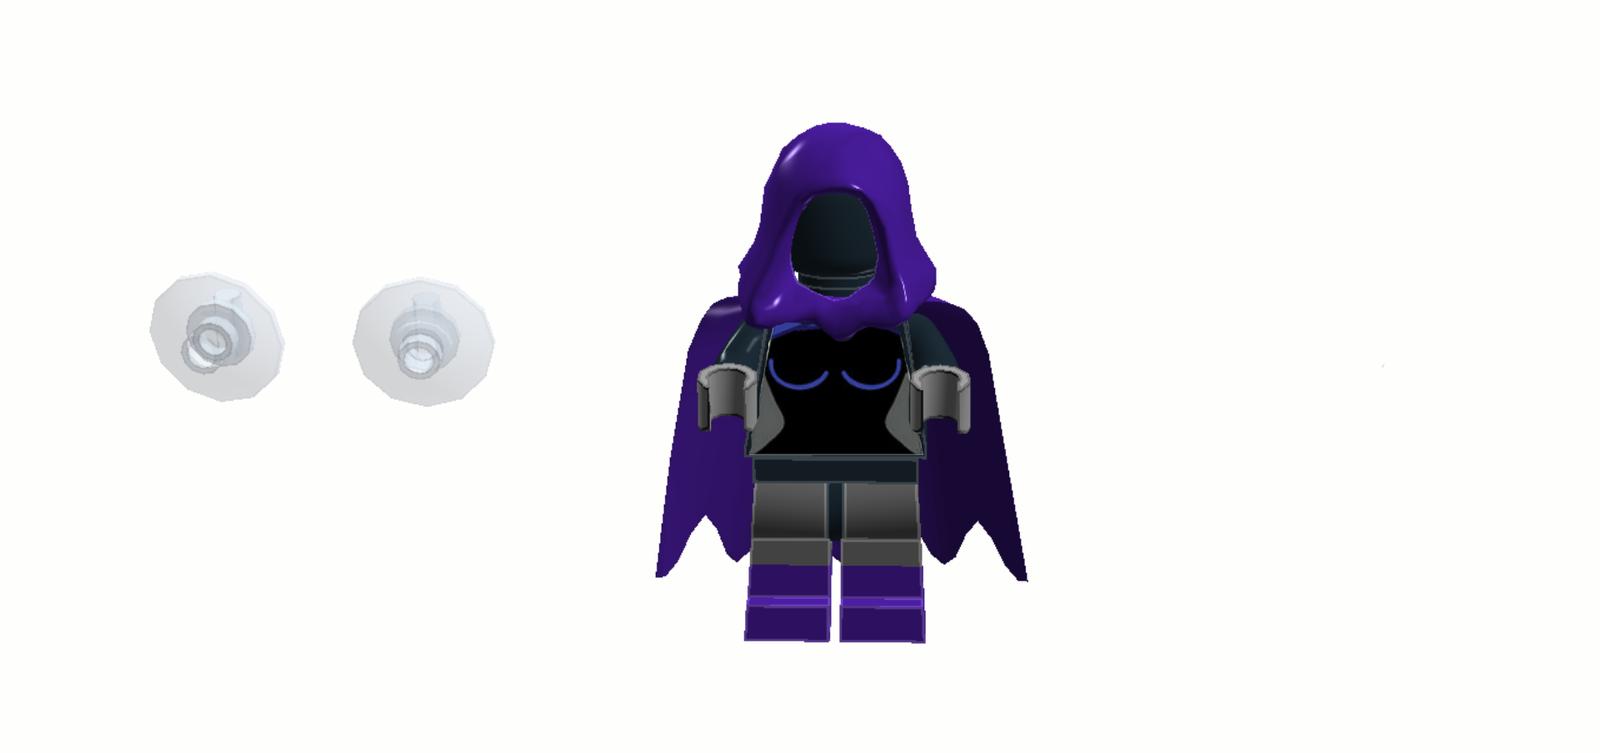 Lego Ideas - Product Ideas - Teen Titans Go Titans Jet-7010